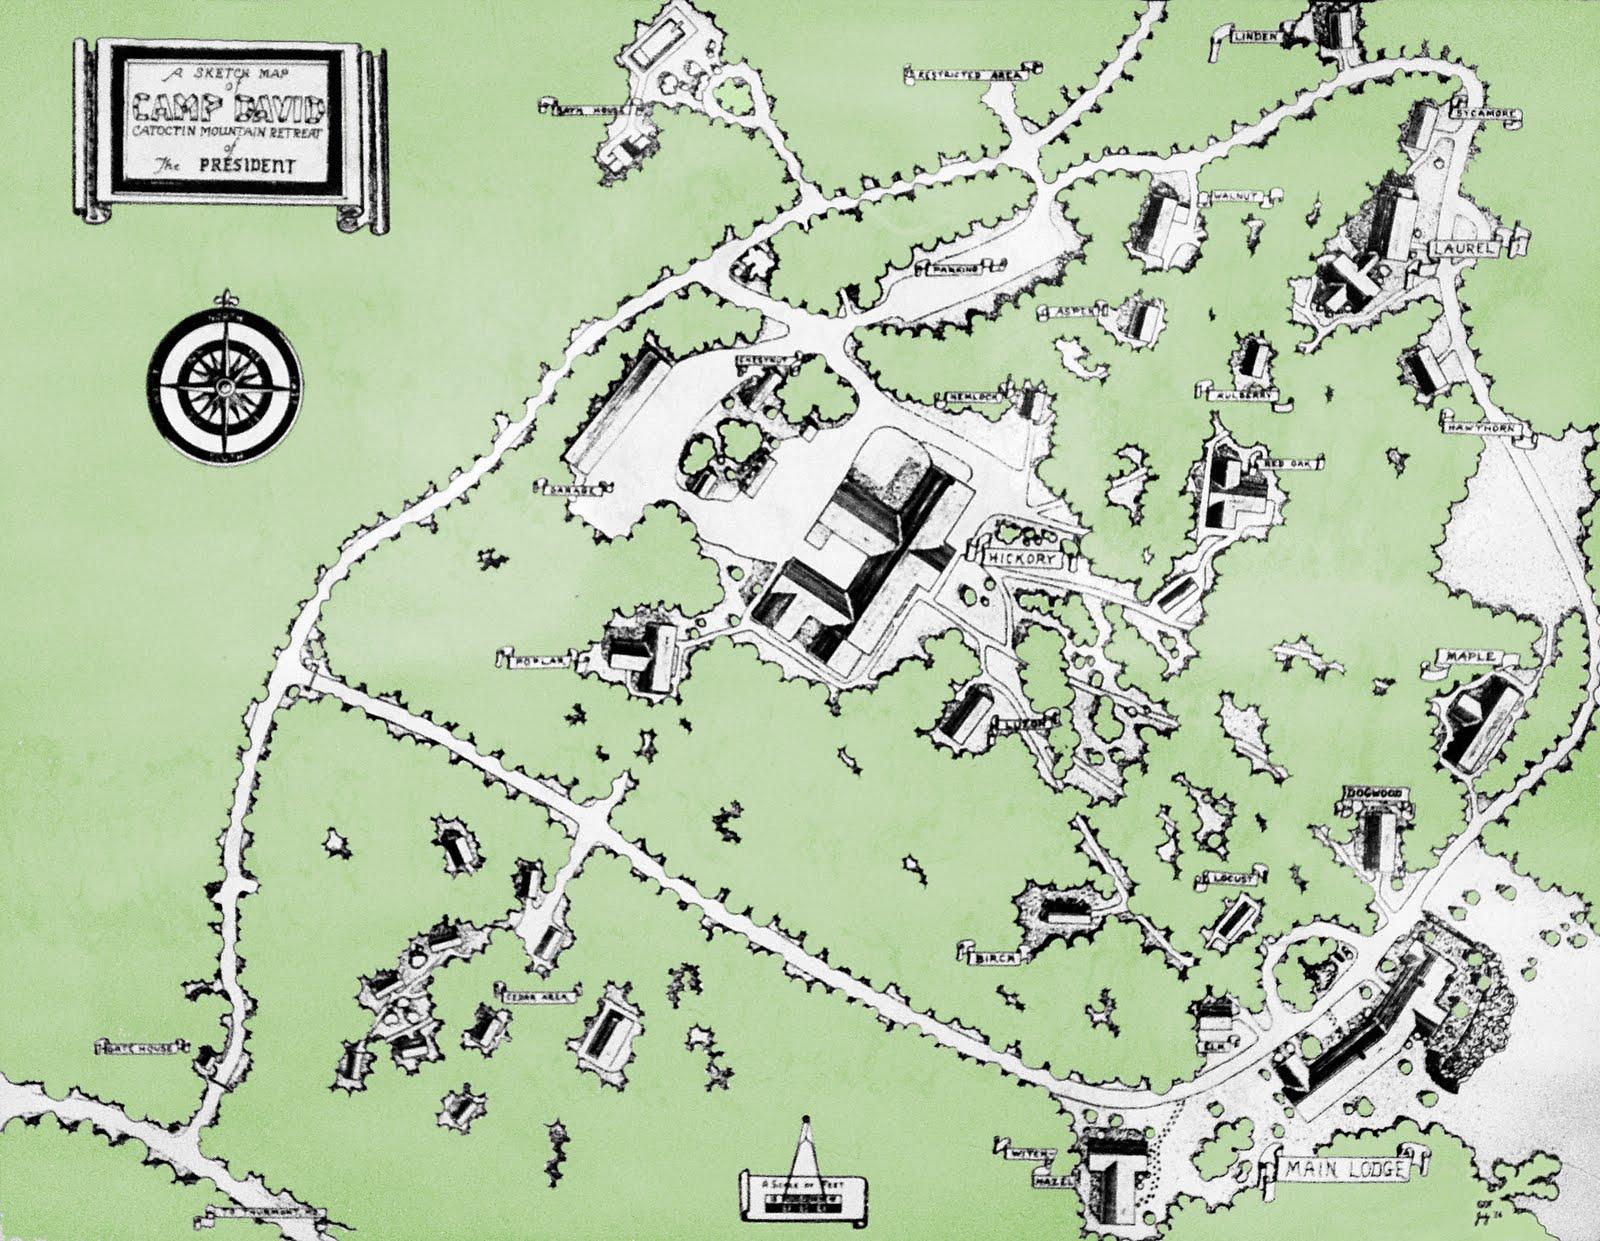 Map of Camp David